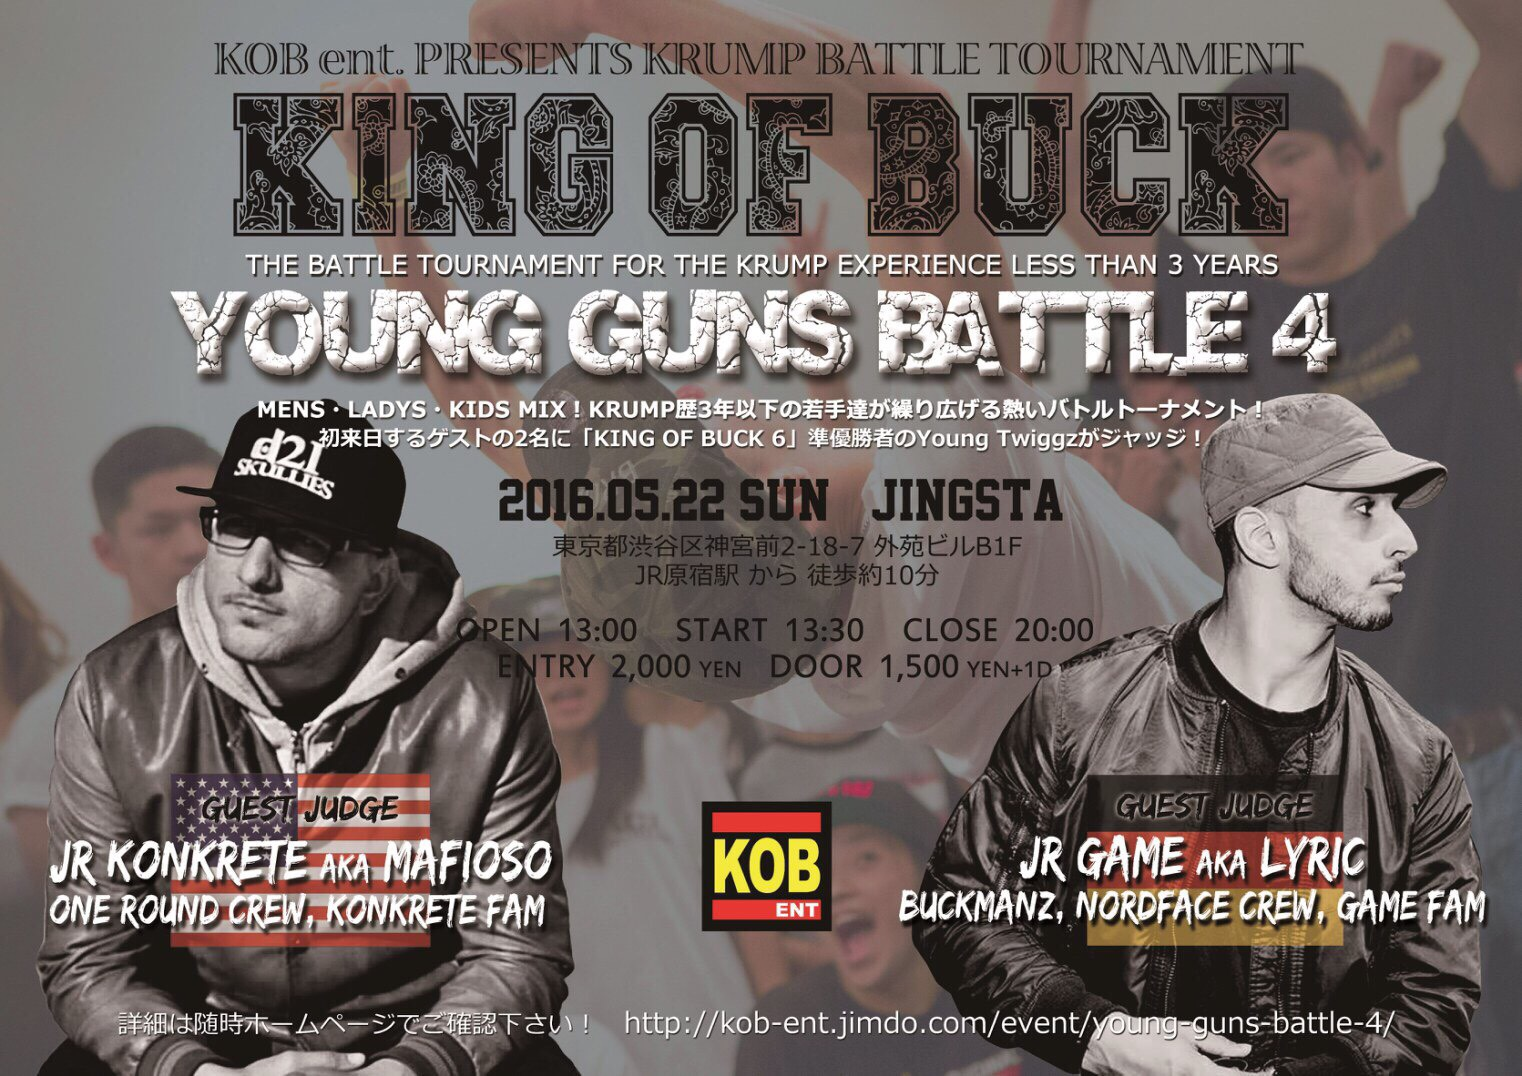 KOB Yung Gunz Battle 4